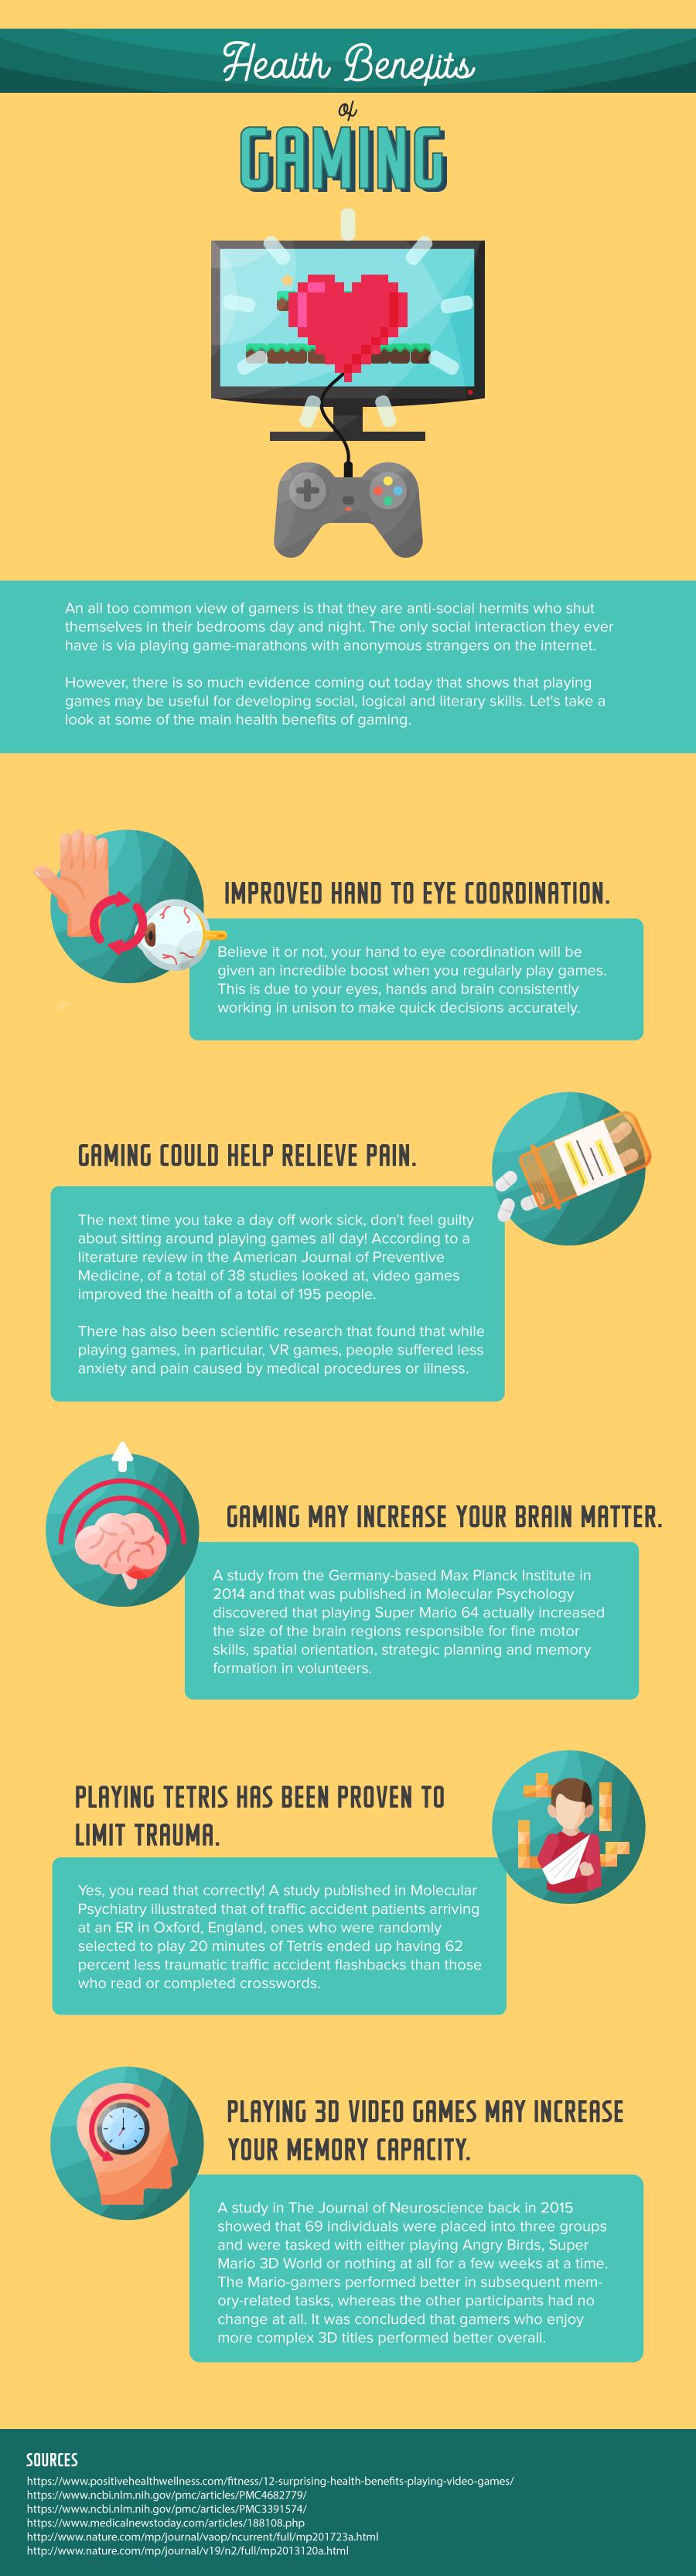 health benefits of gaming - Health Benefits of Gaming